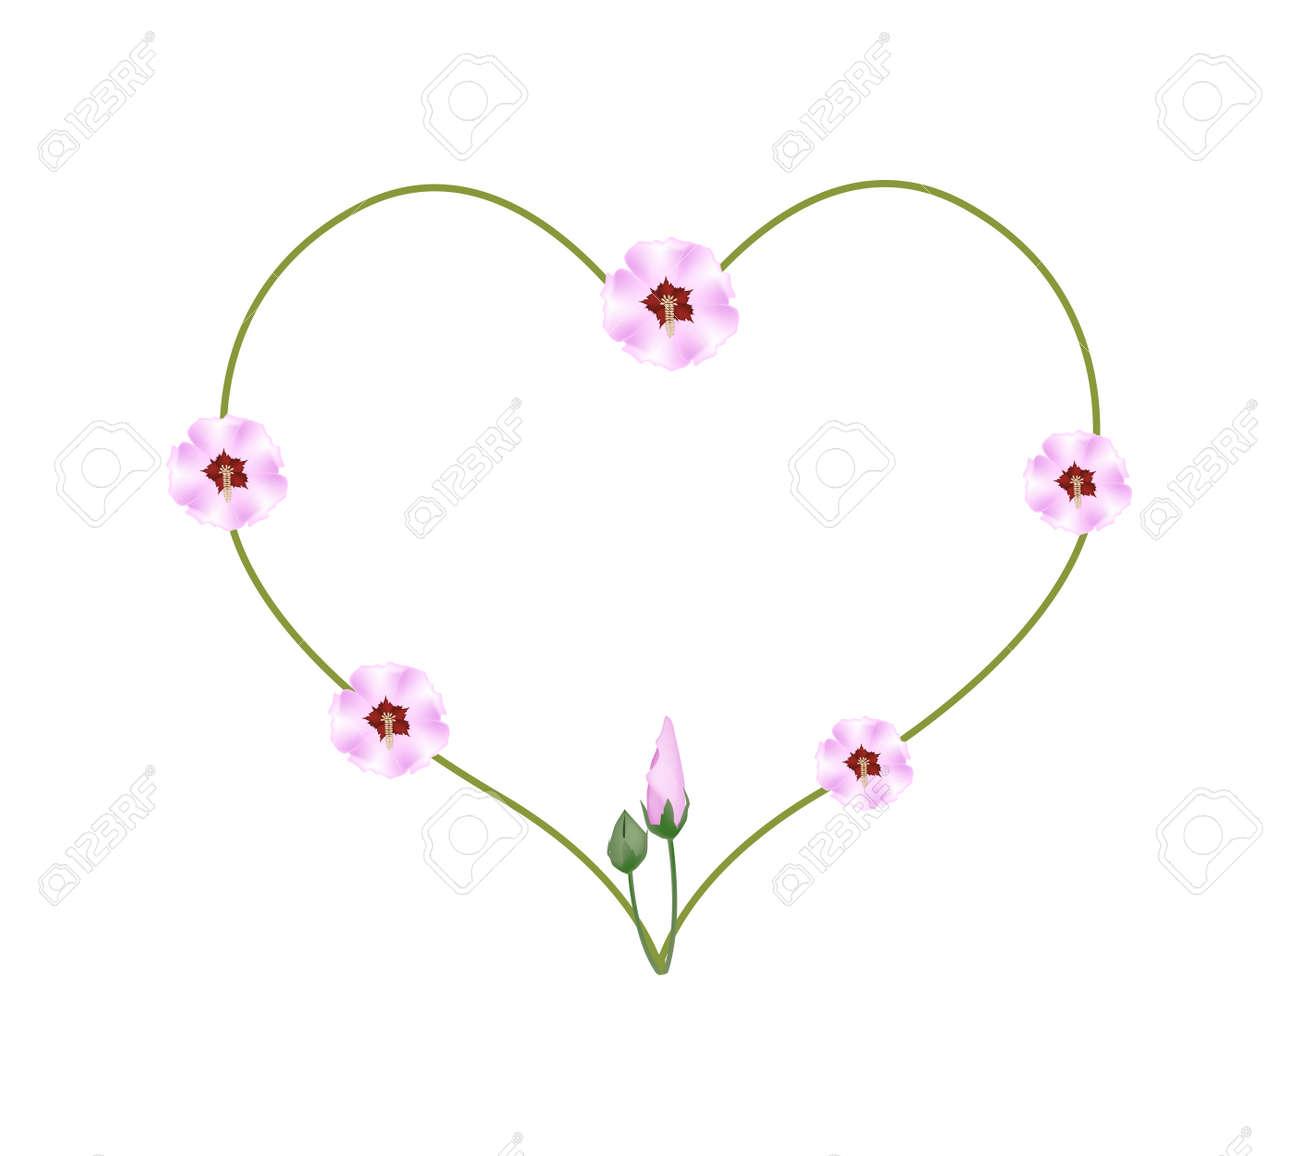 Download 420 Koleksi Background Bunga Flower Terbaik